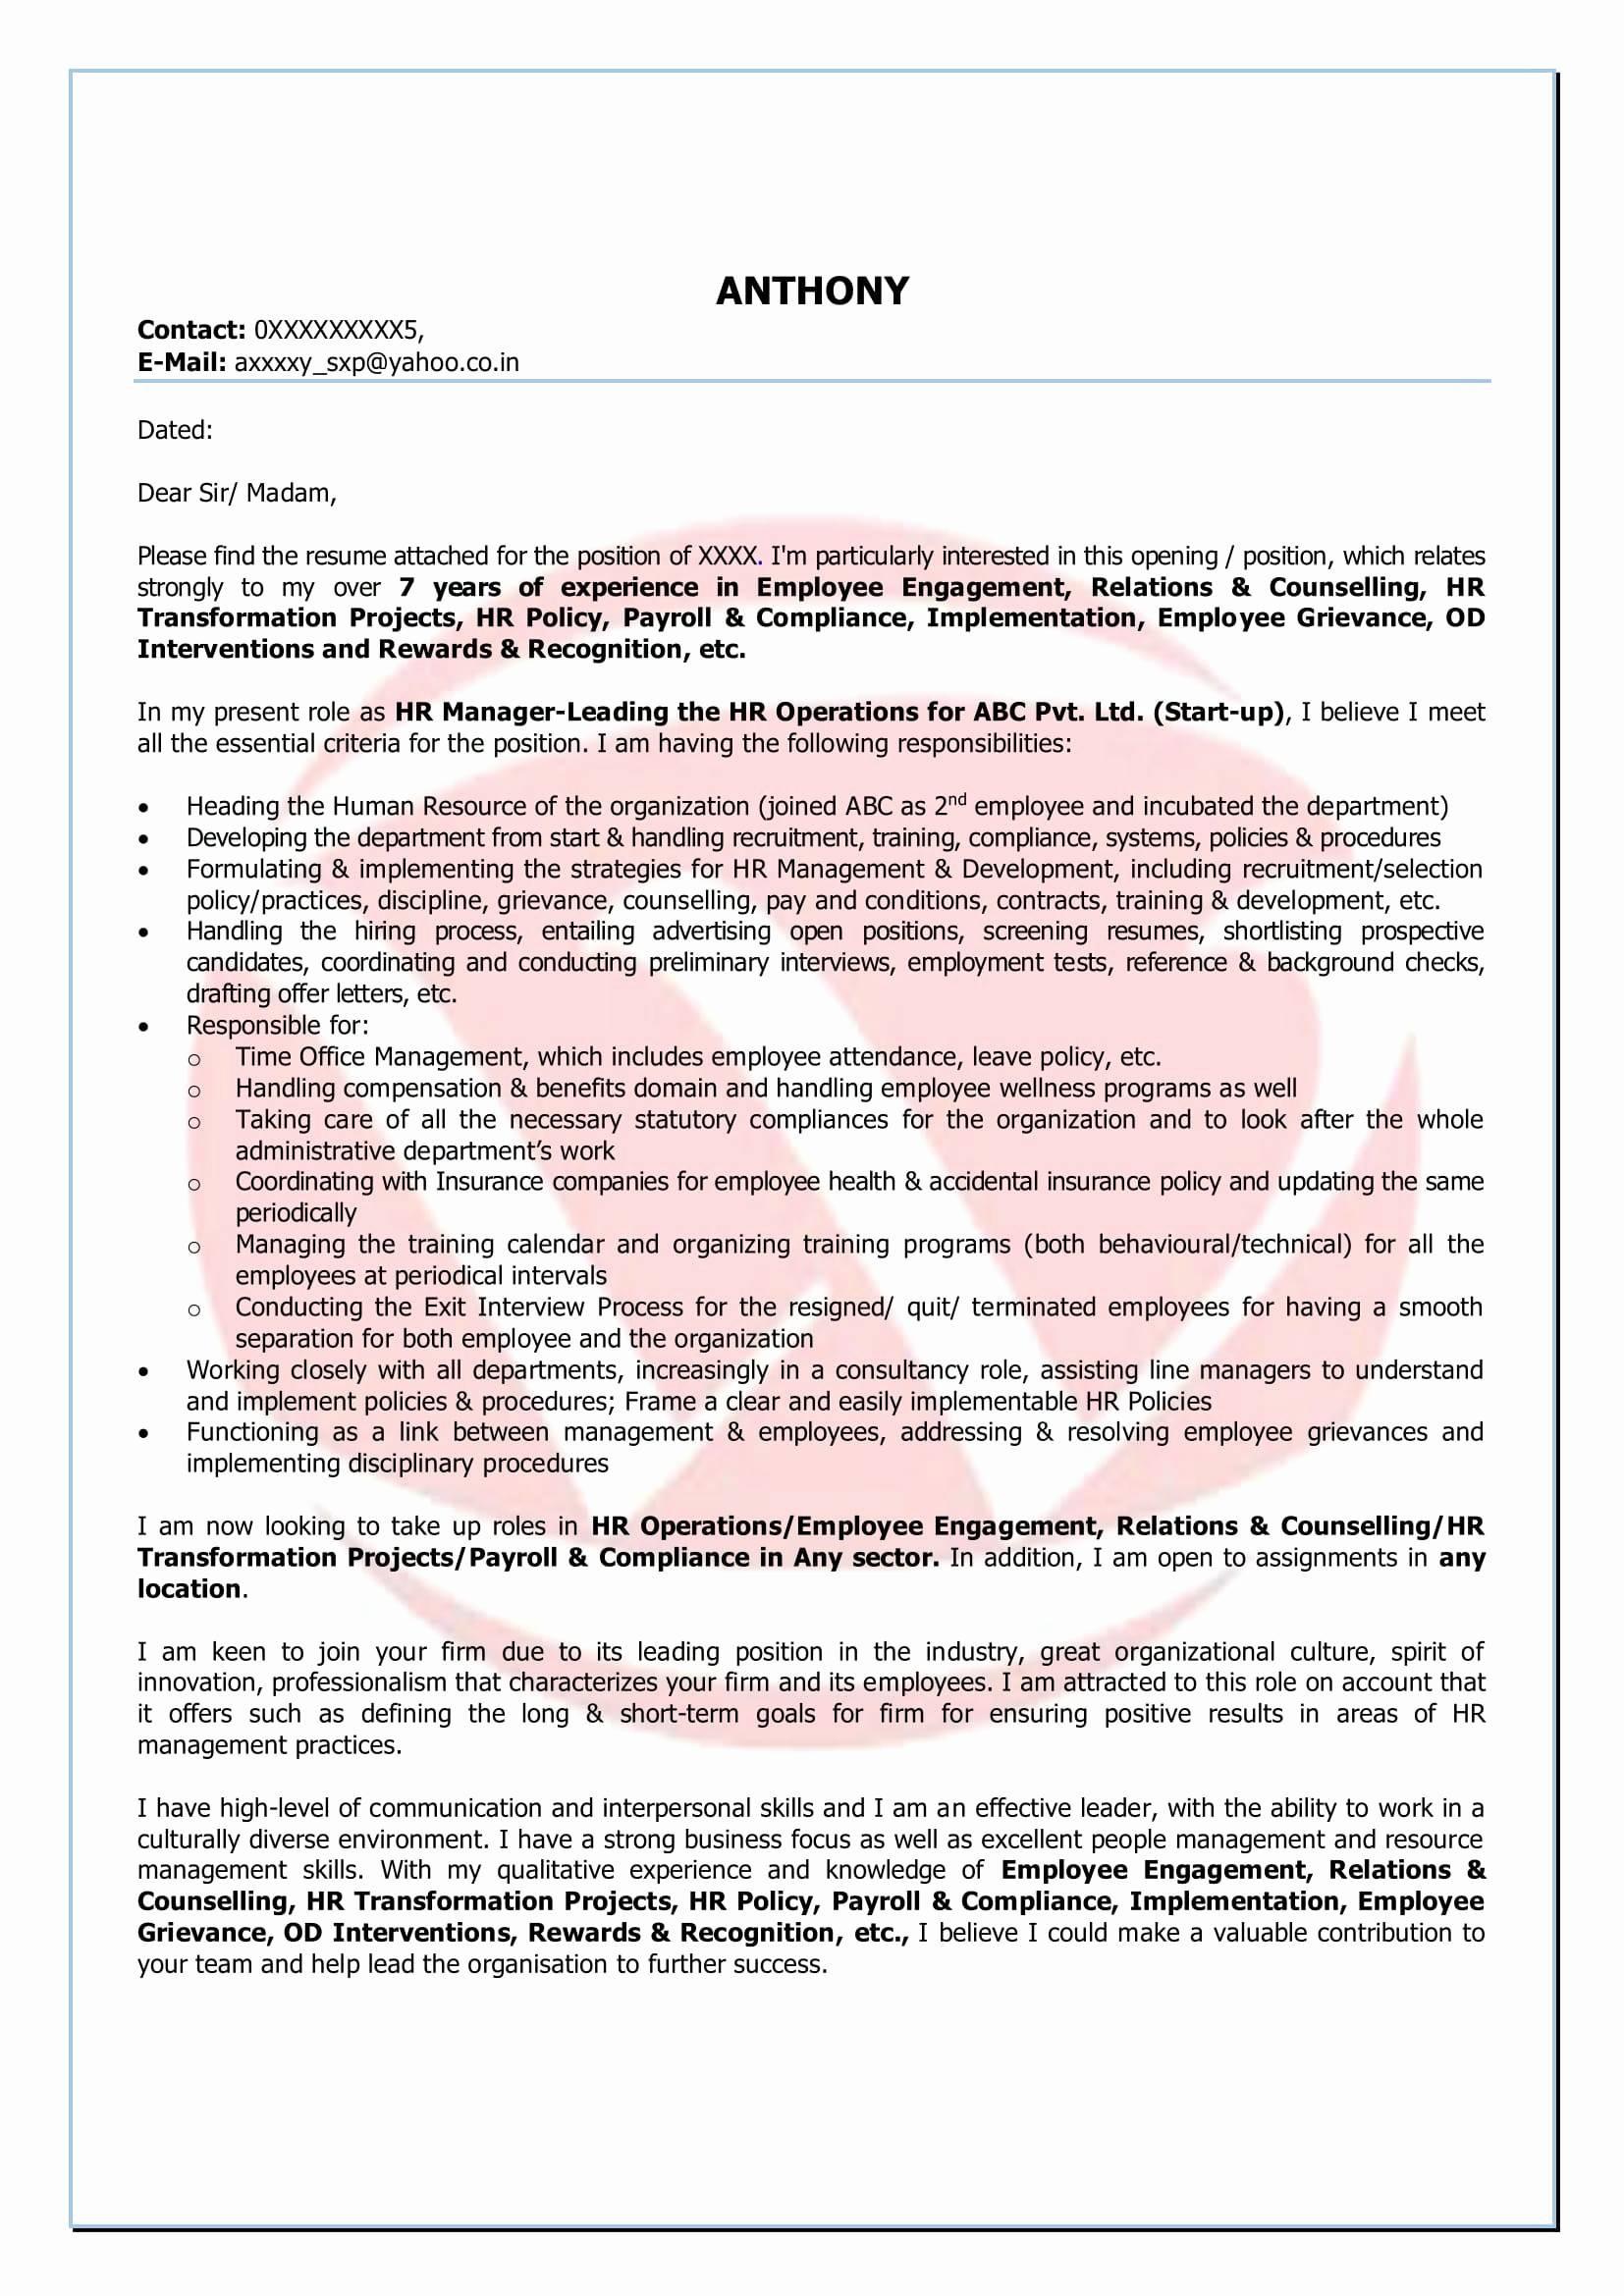 Change Of Management Letter Template - Internal Transfer Letter Template New 10 Inspirational Internal